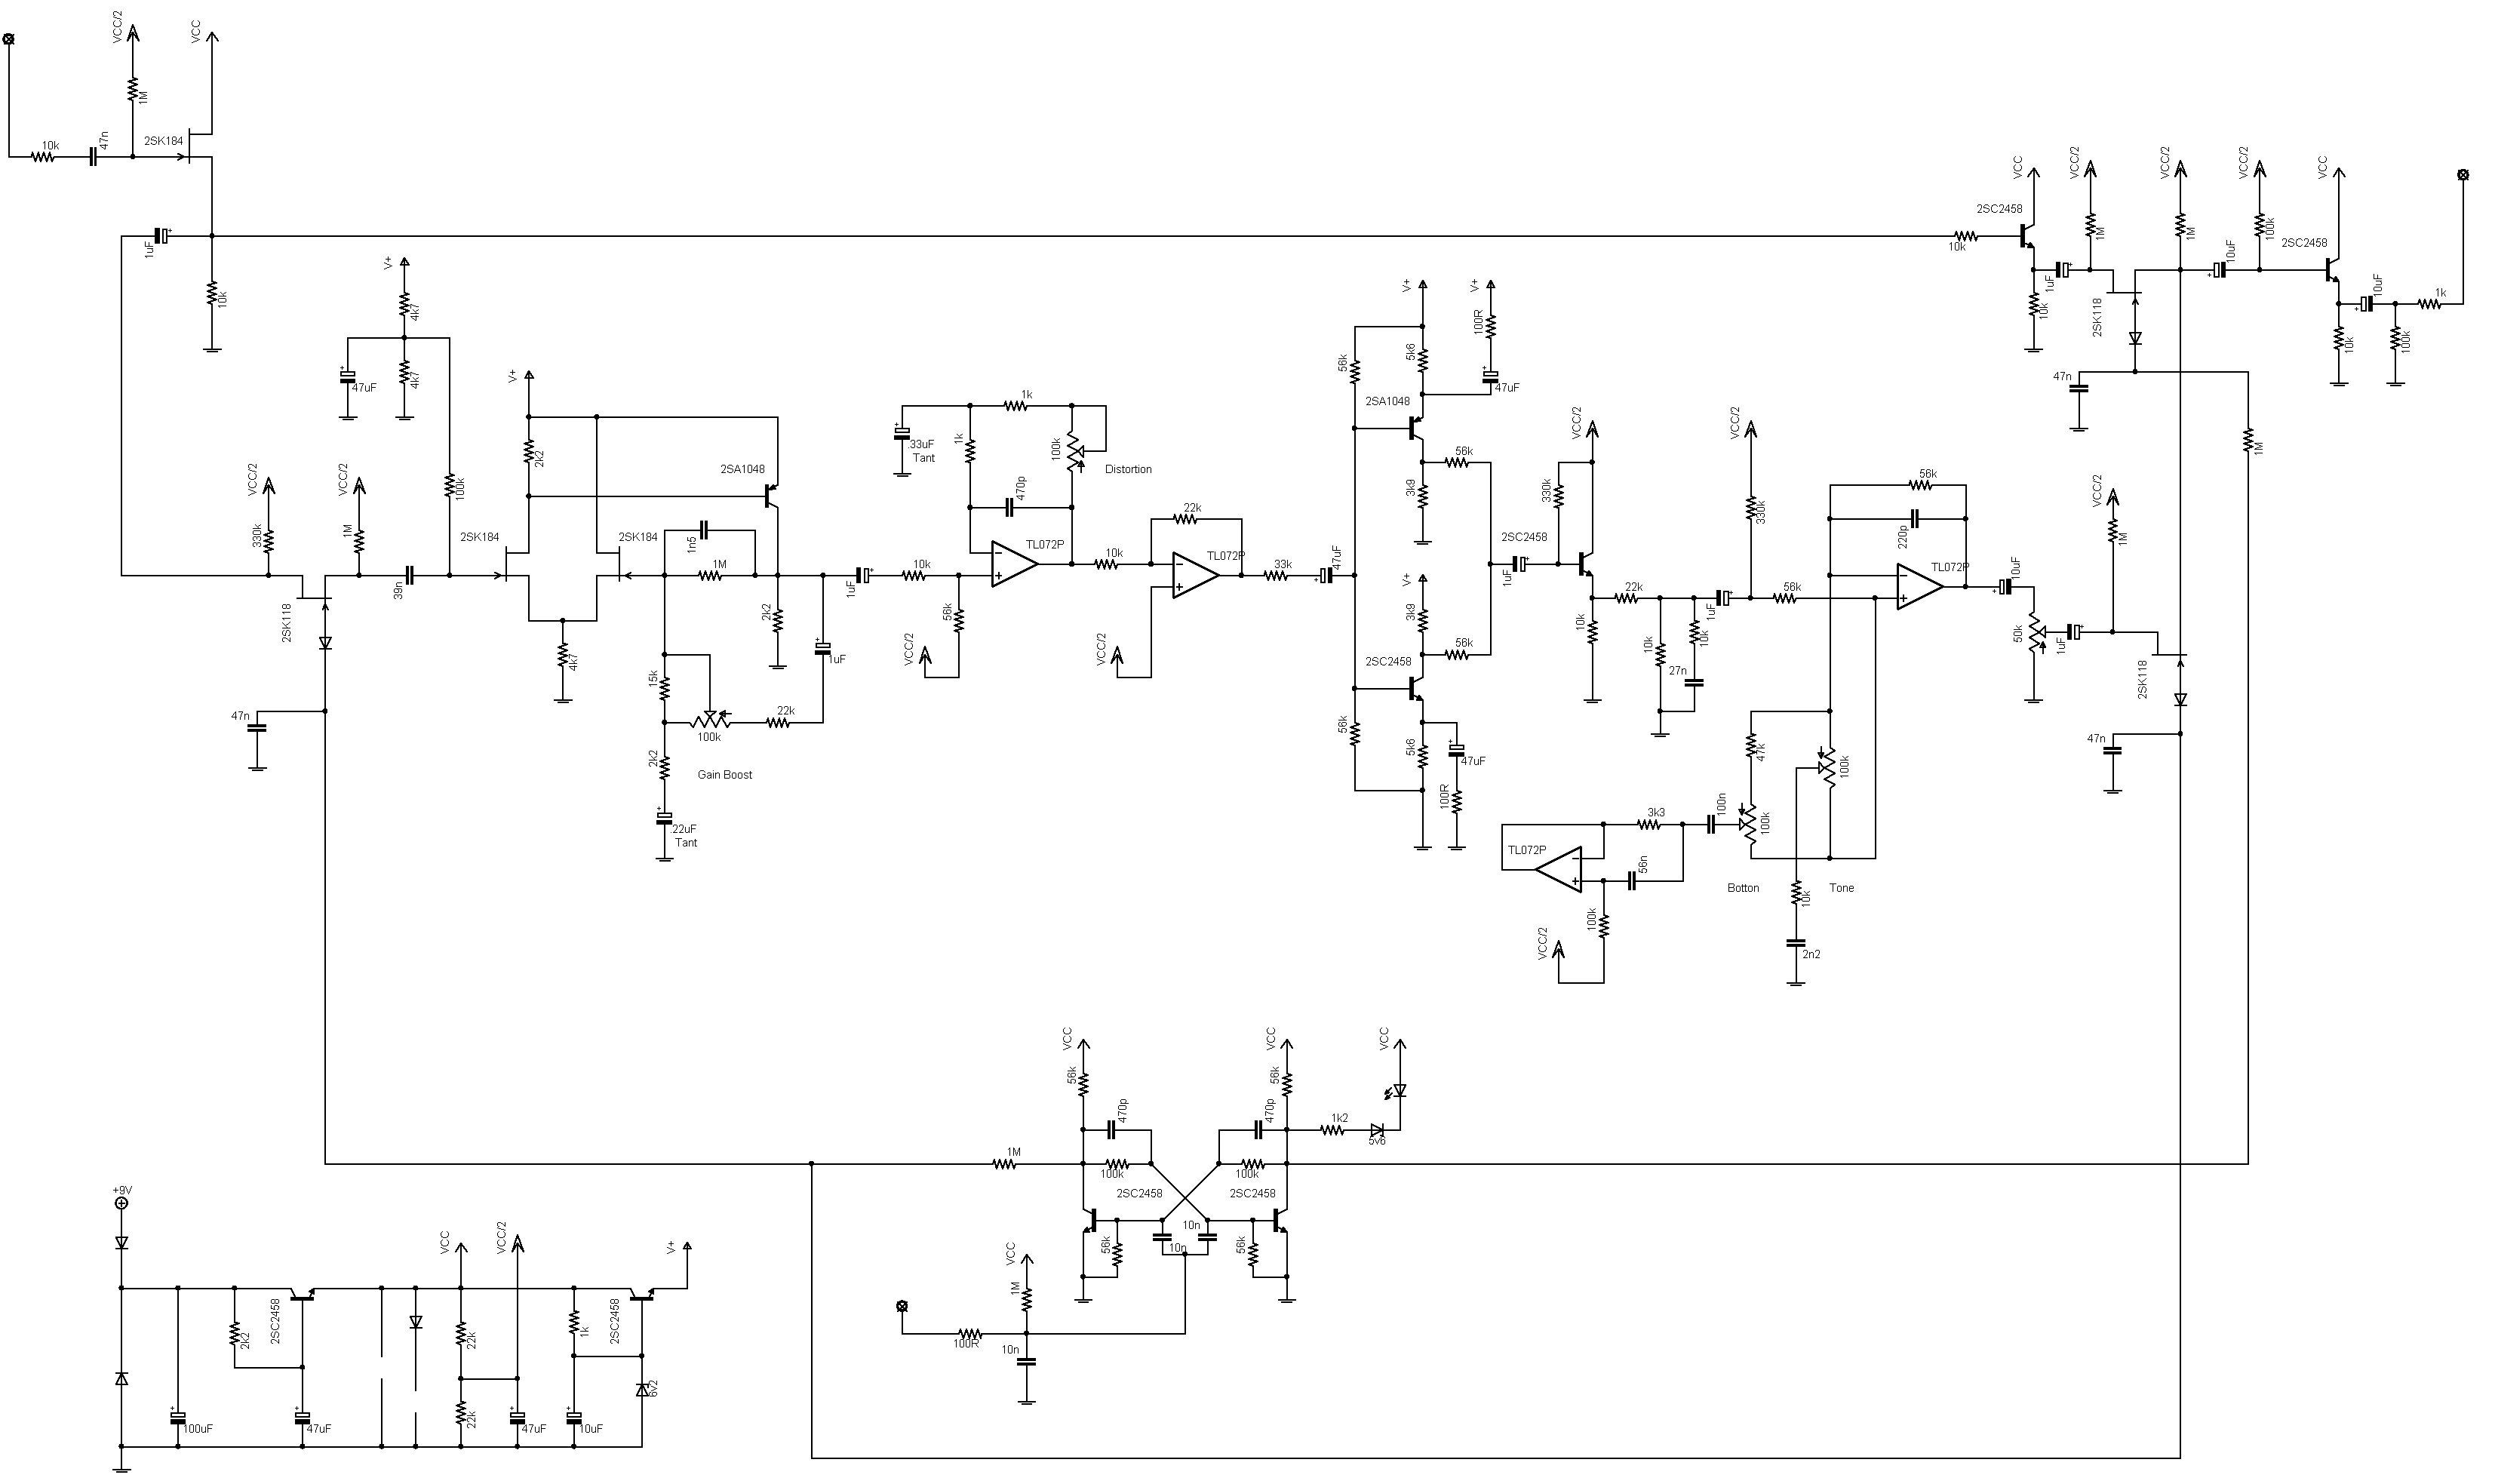 Gfs Wiring Diagram Library Dark Telecaster Free Download Schematic Guitar Schematics Auto Diagrams Instructions Hss Danelectroguitarwiringdiagram Dano